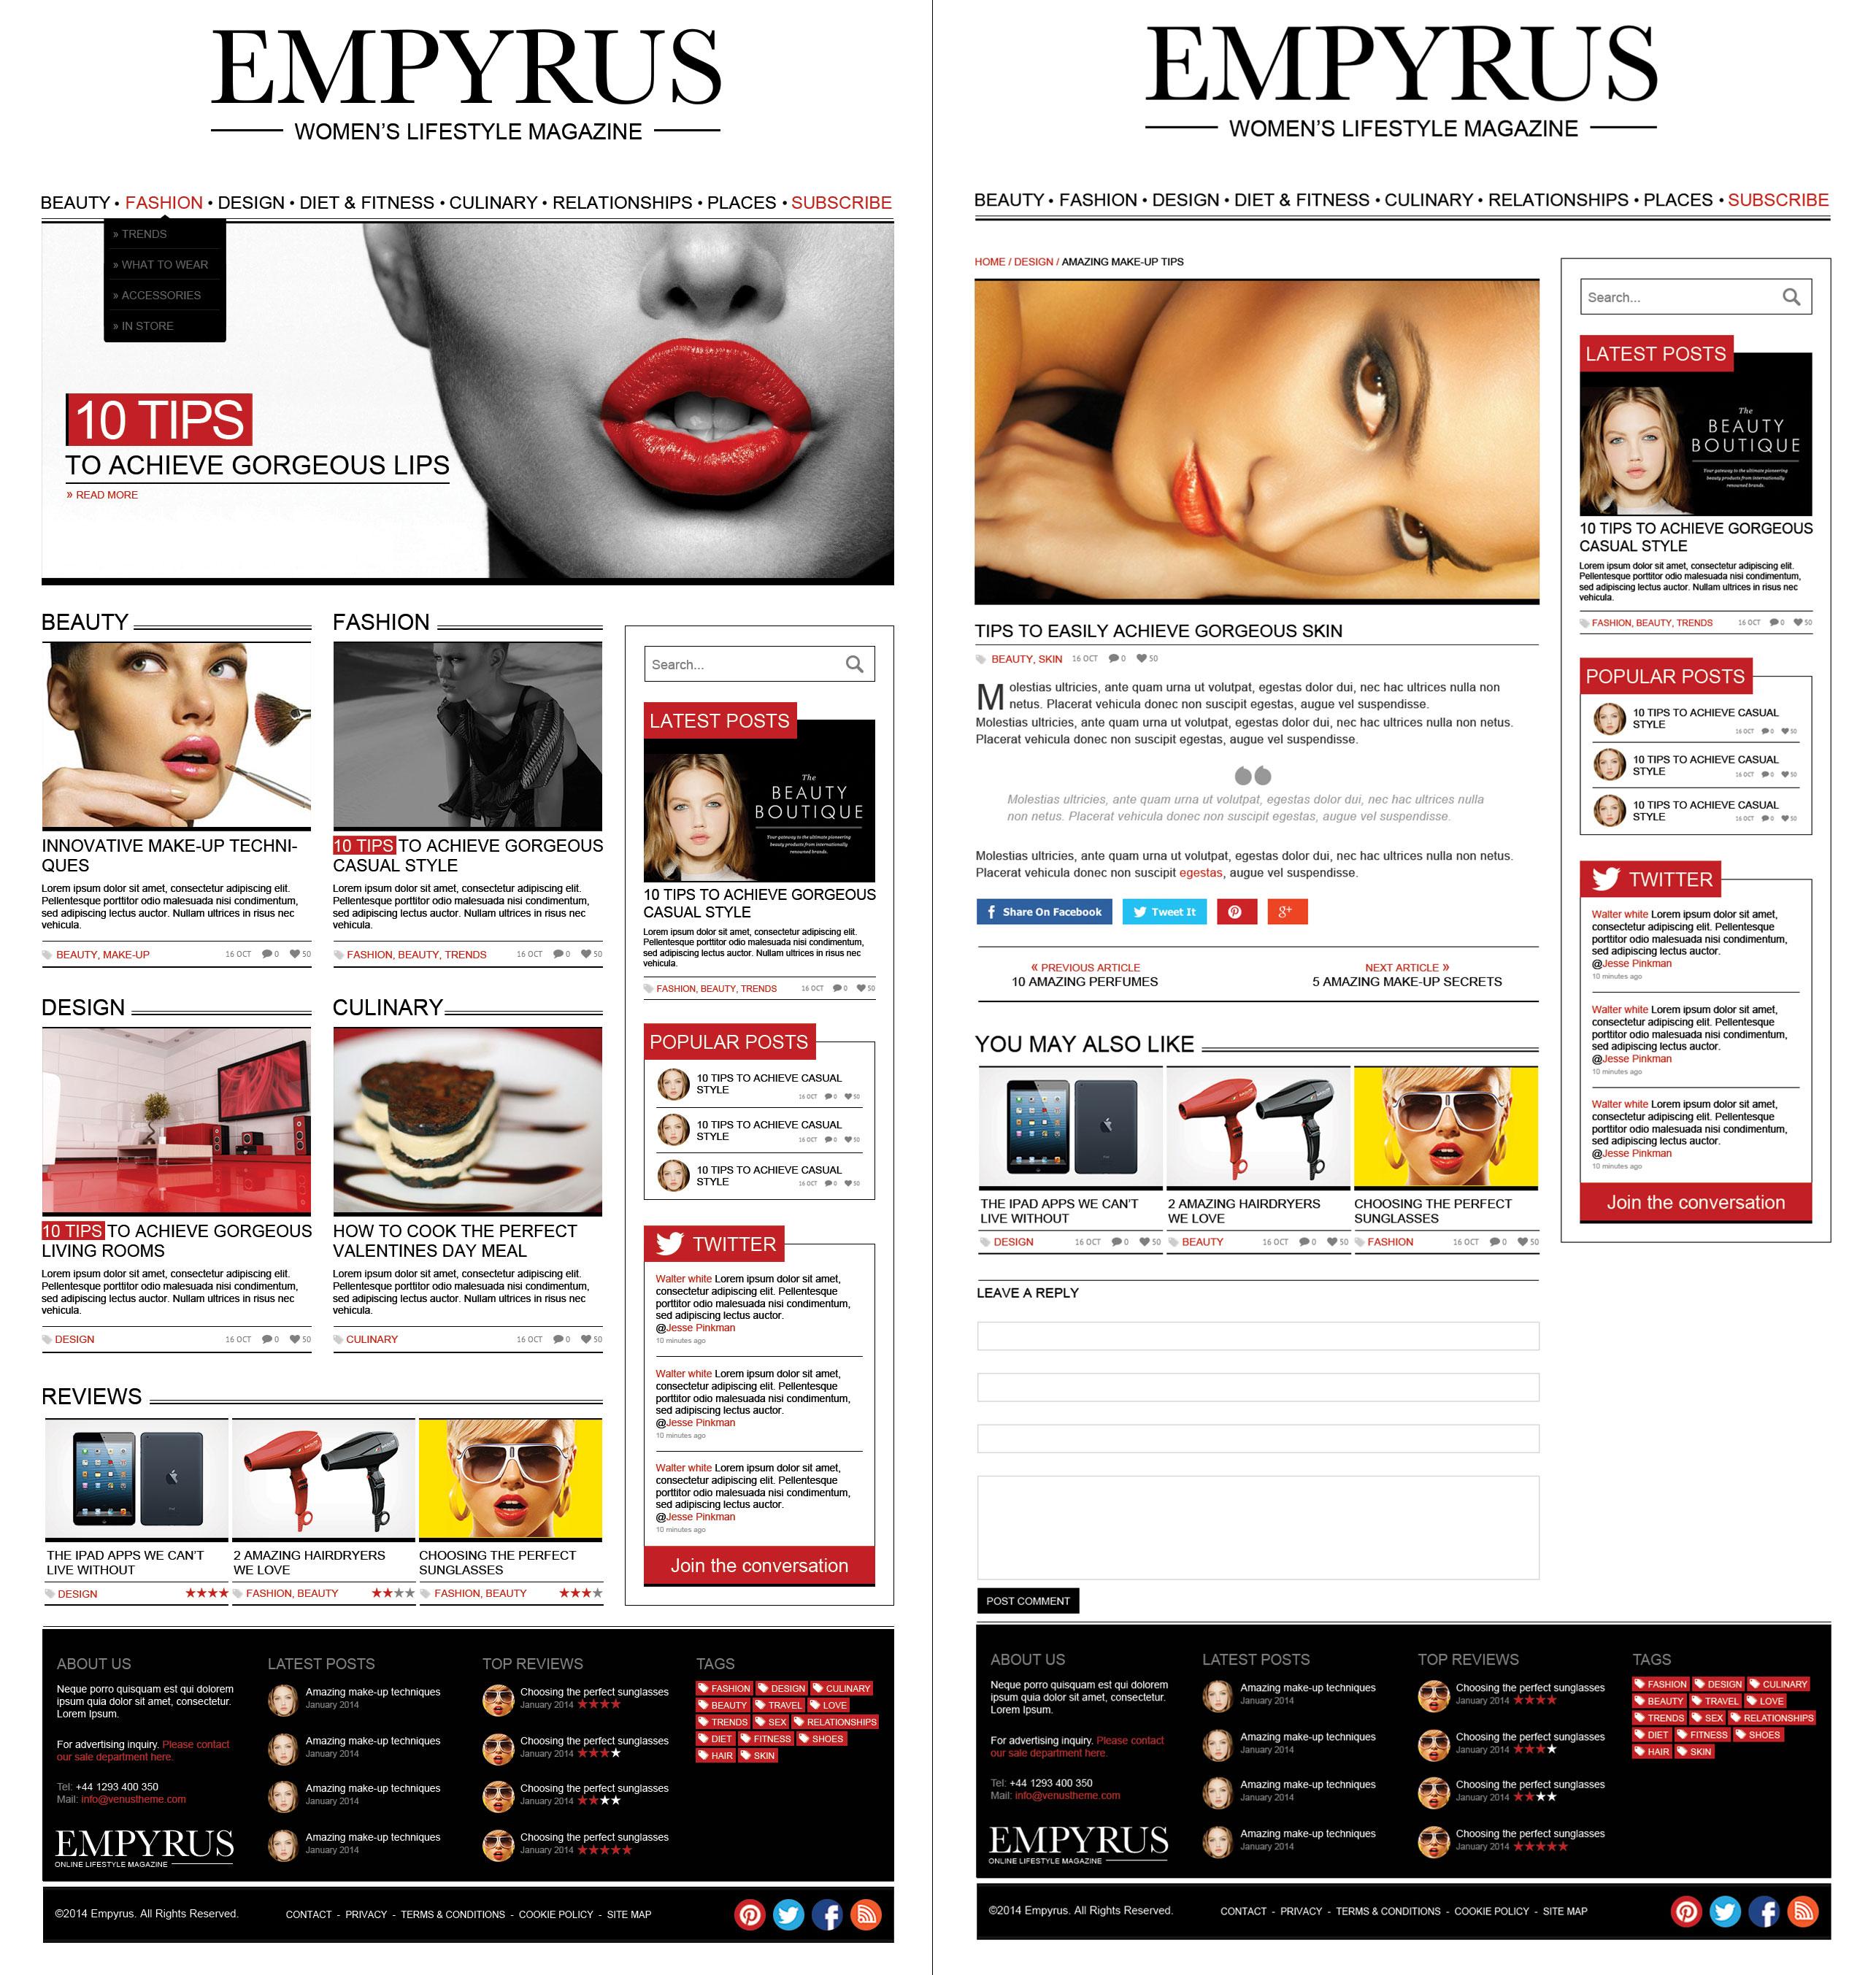 Empyrus - Women's lifestyle magazine